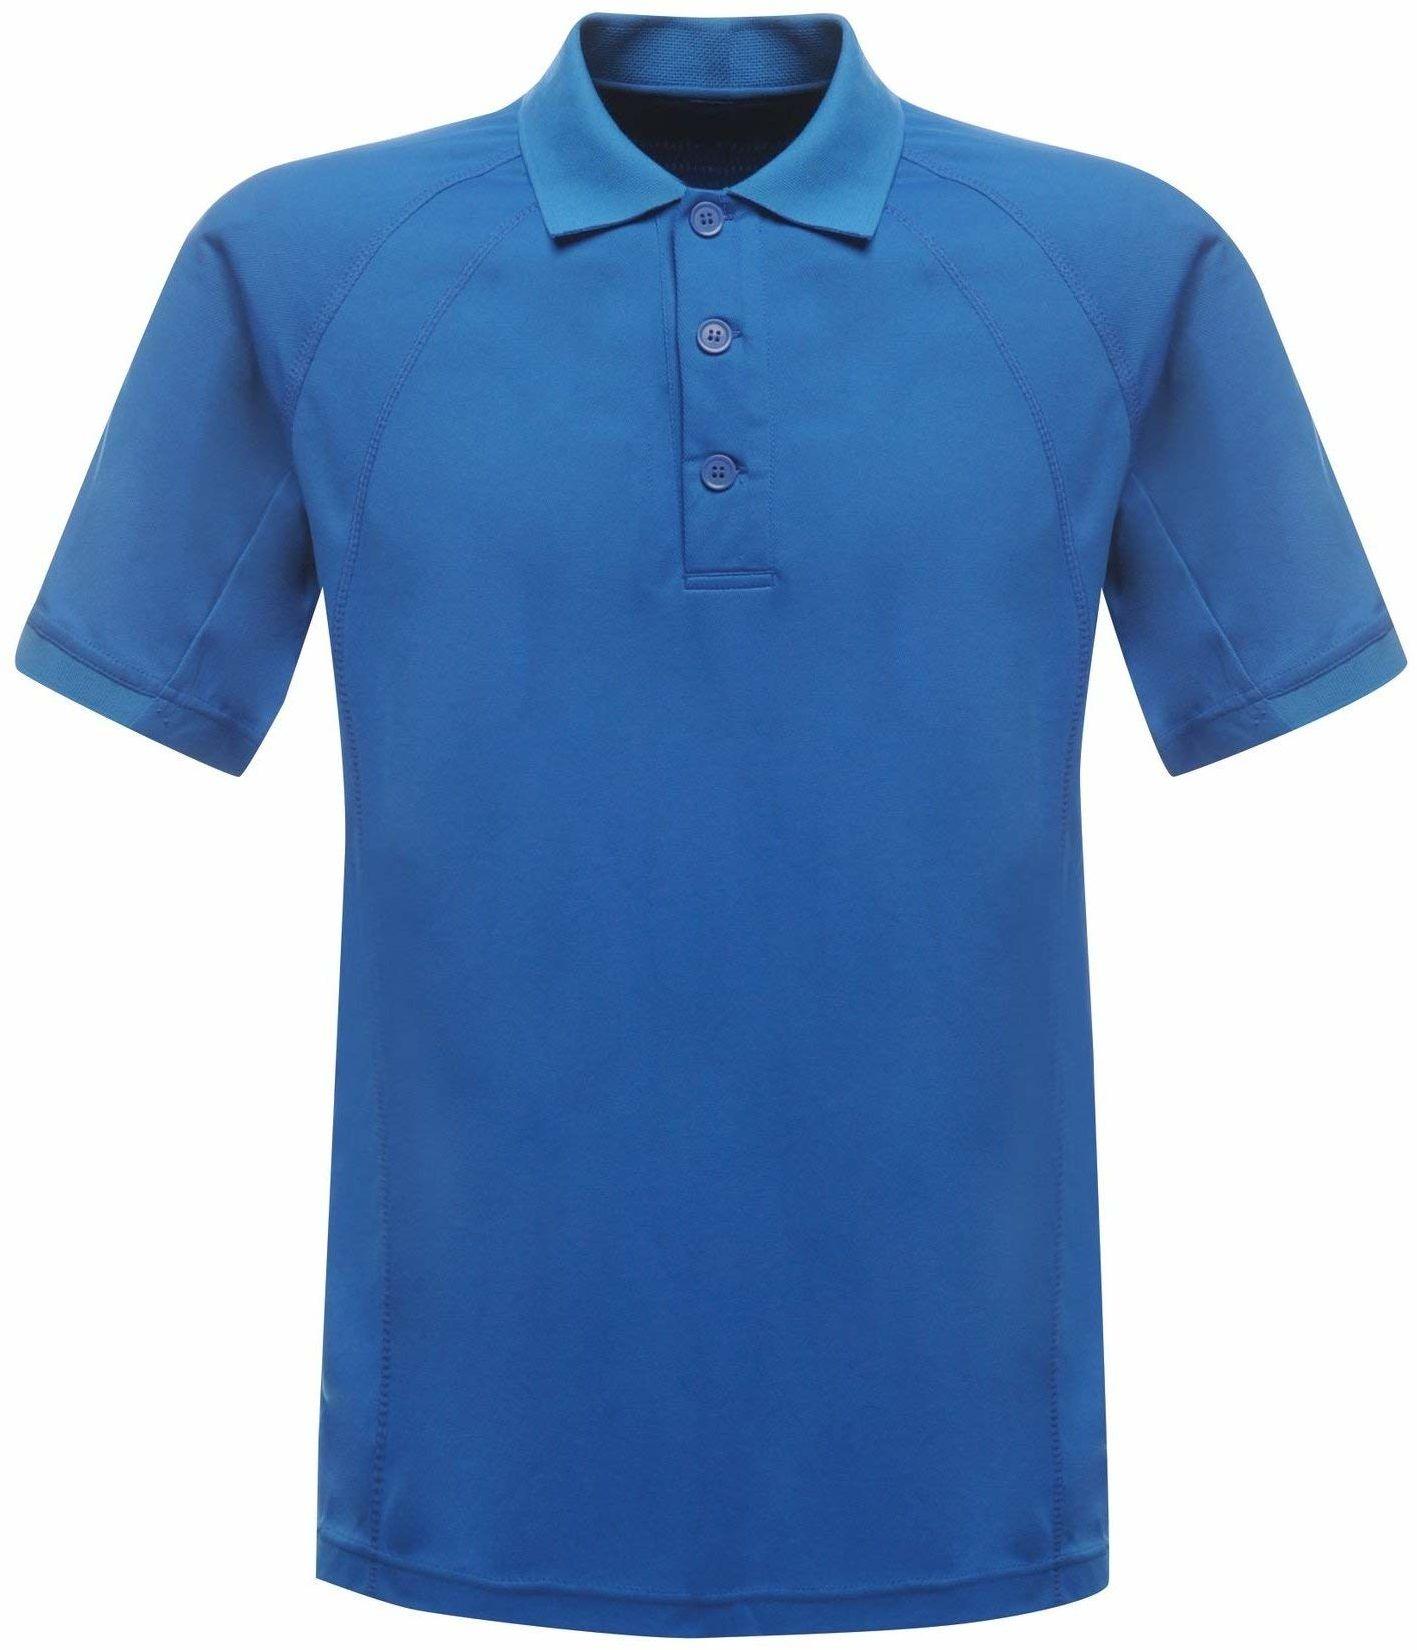 Regatta Męska koszulka polo z krótkim rękawem UTRG2161_14, niebieska (Oxford Blue), średnia